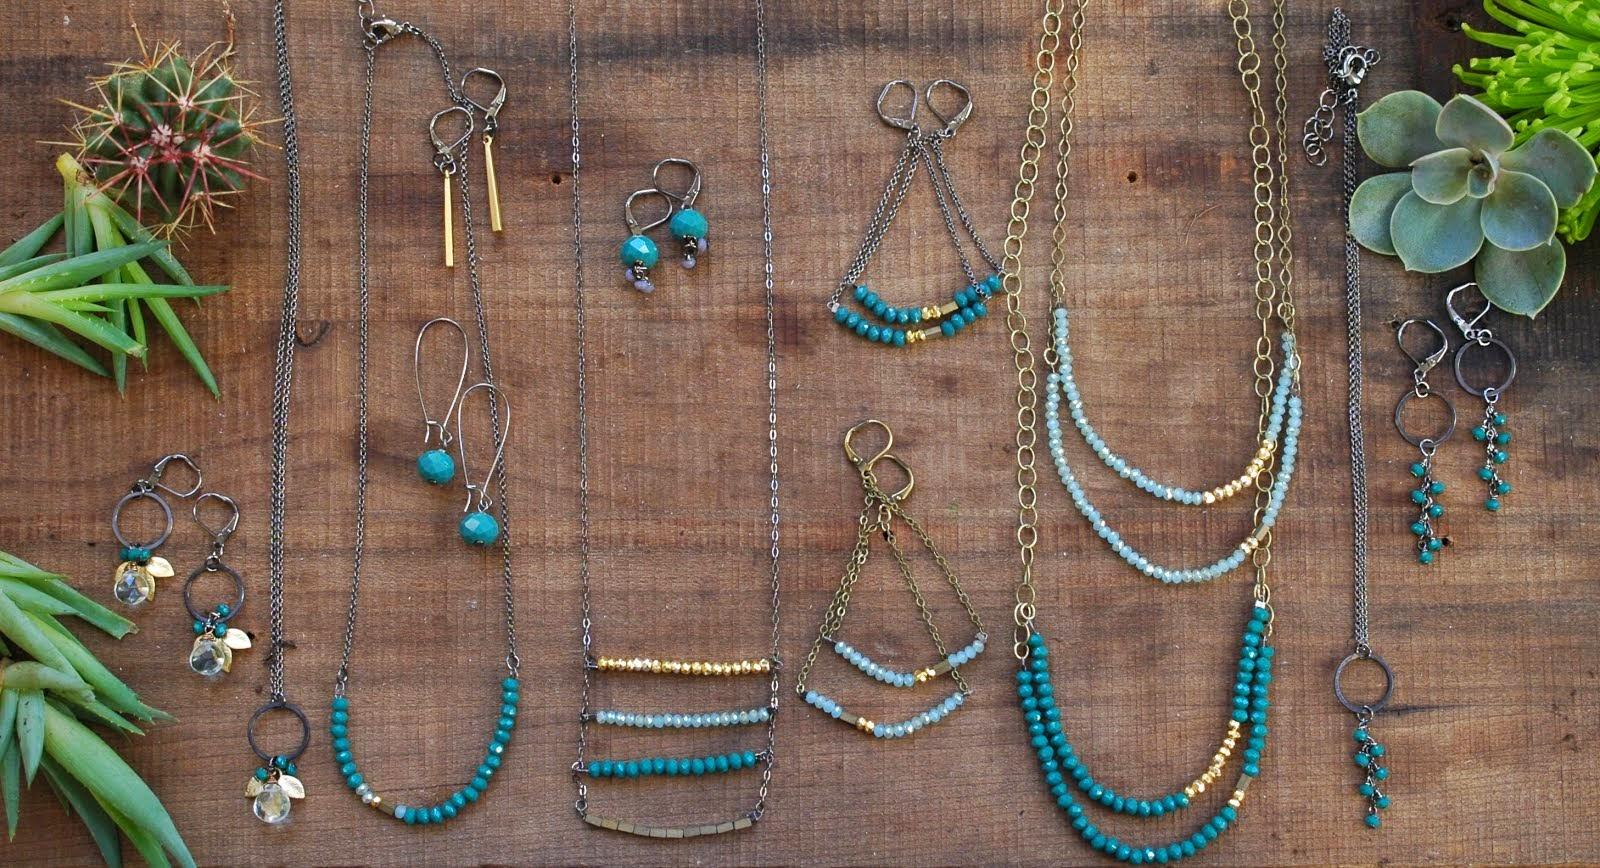 harlow jewelry